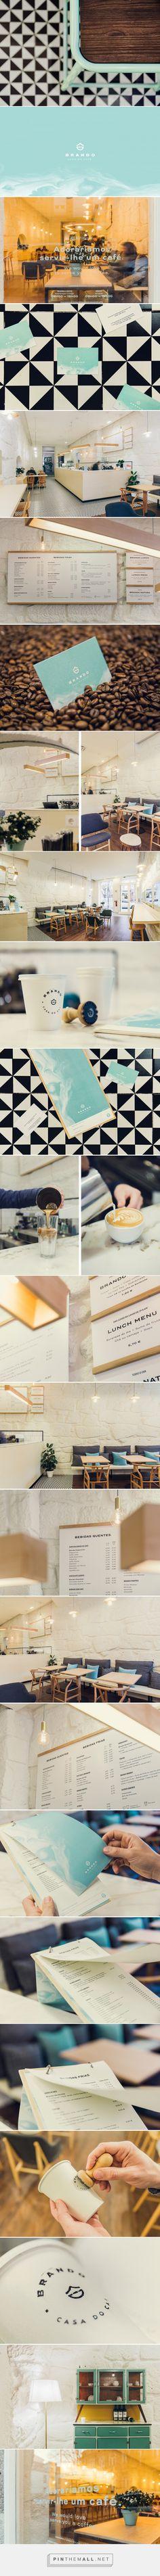 Brando – Casa do Café on Behance - created via https://pinthemall.net